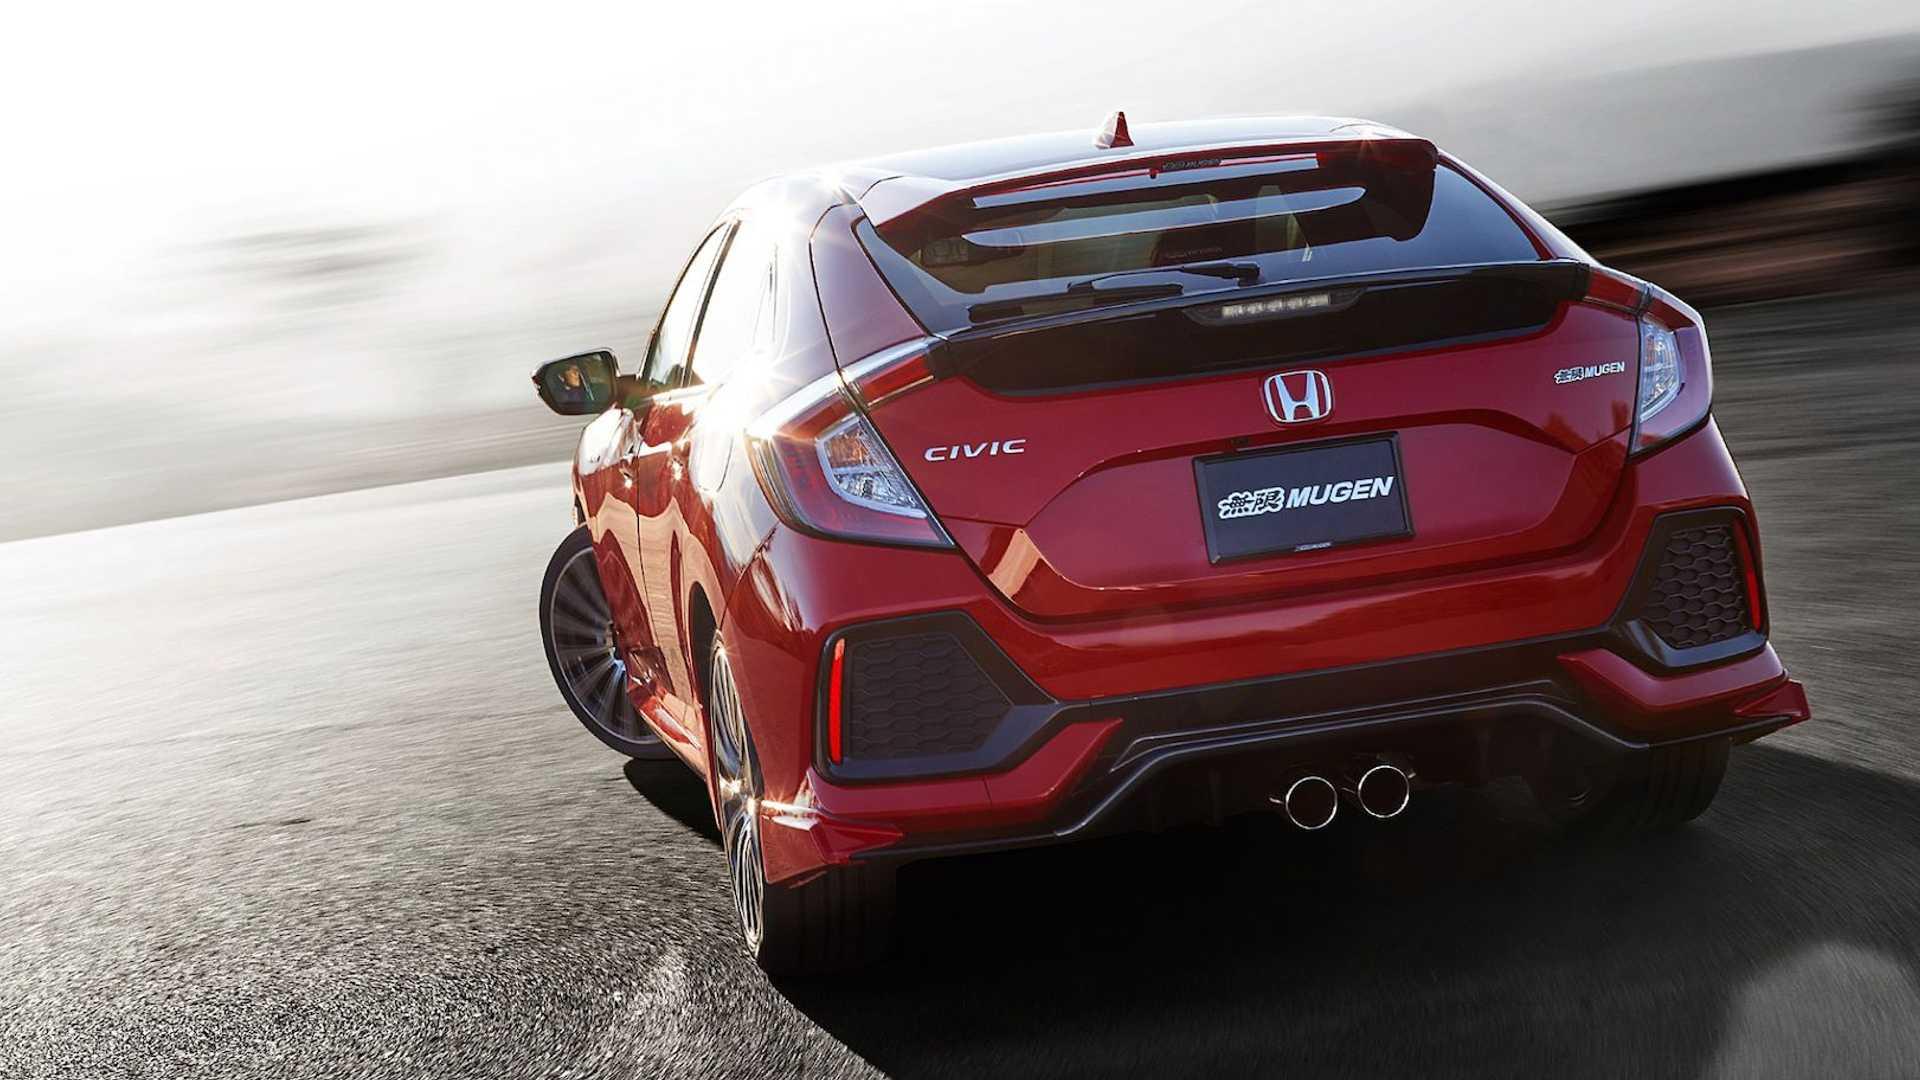 honda-civic-hatchback-mugen-red---rear-beauty